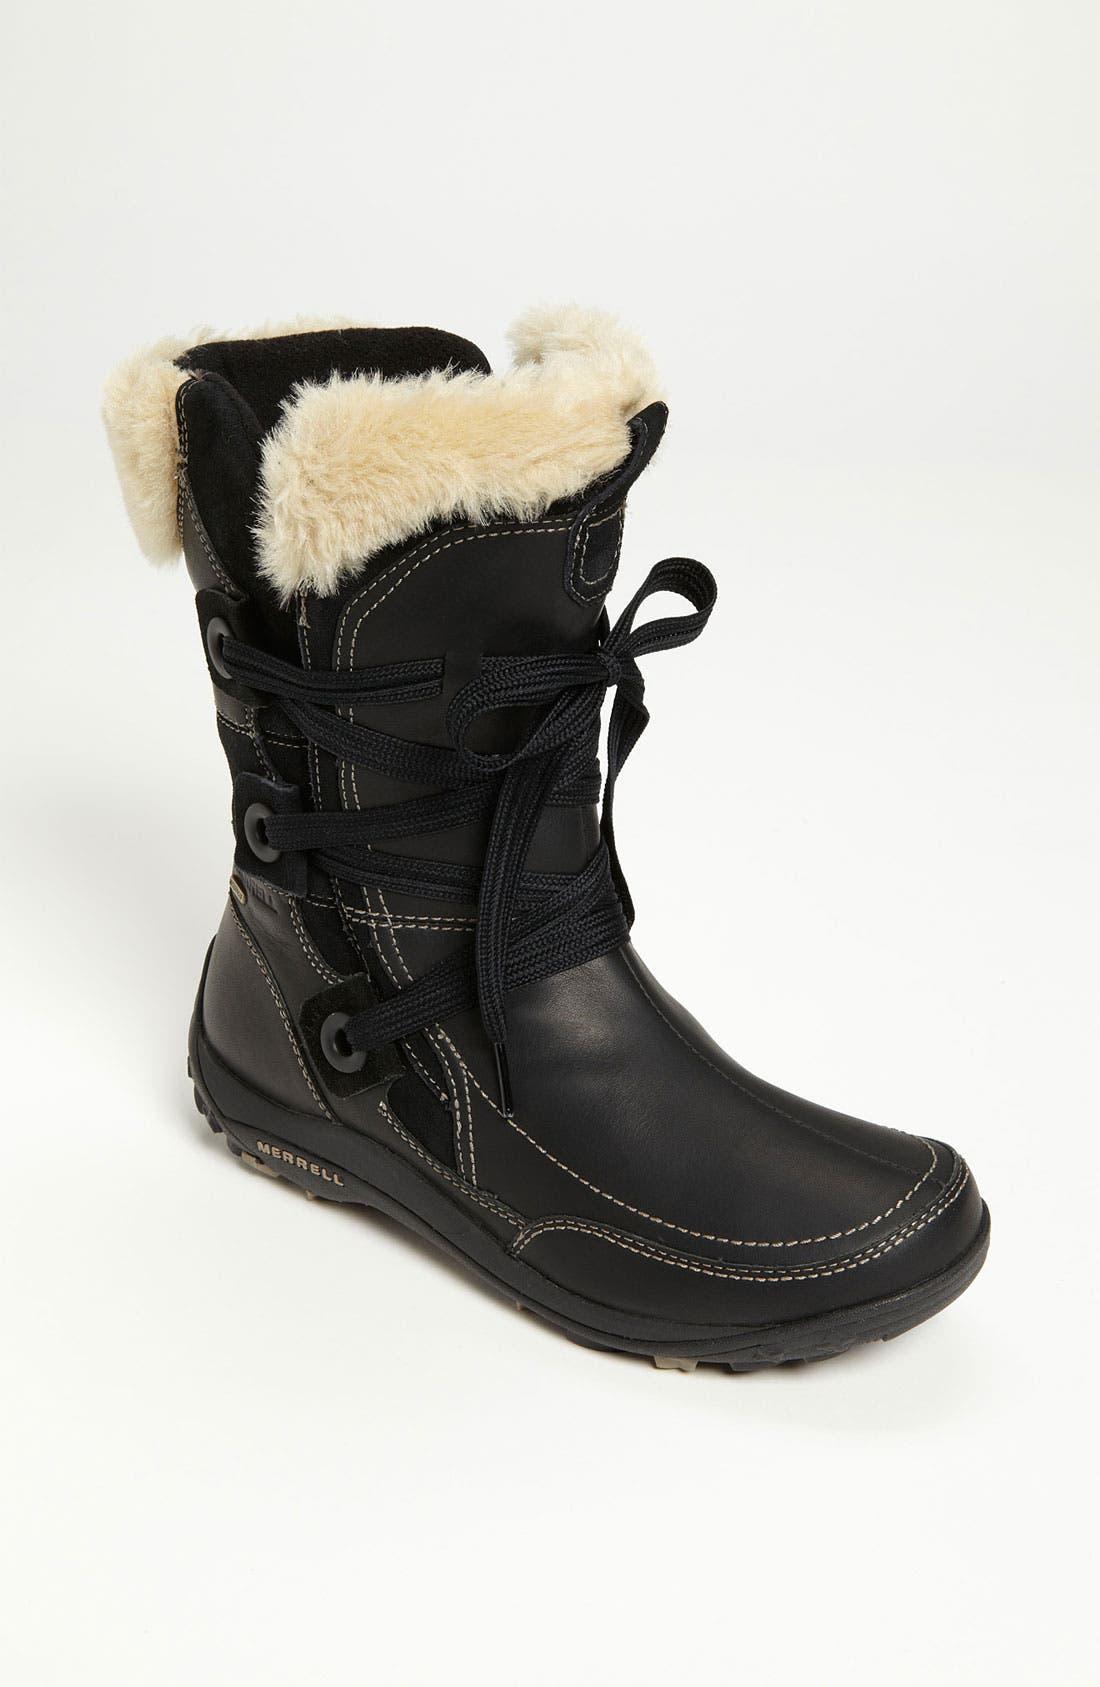 Main Image - Merrell 'Nikita' Waterproof Boot